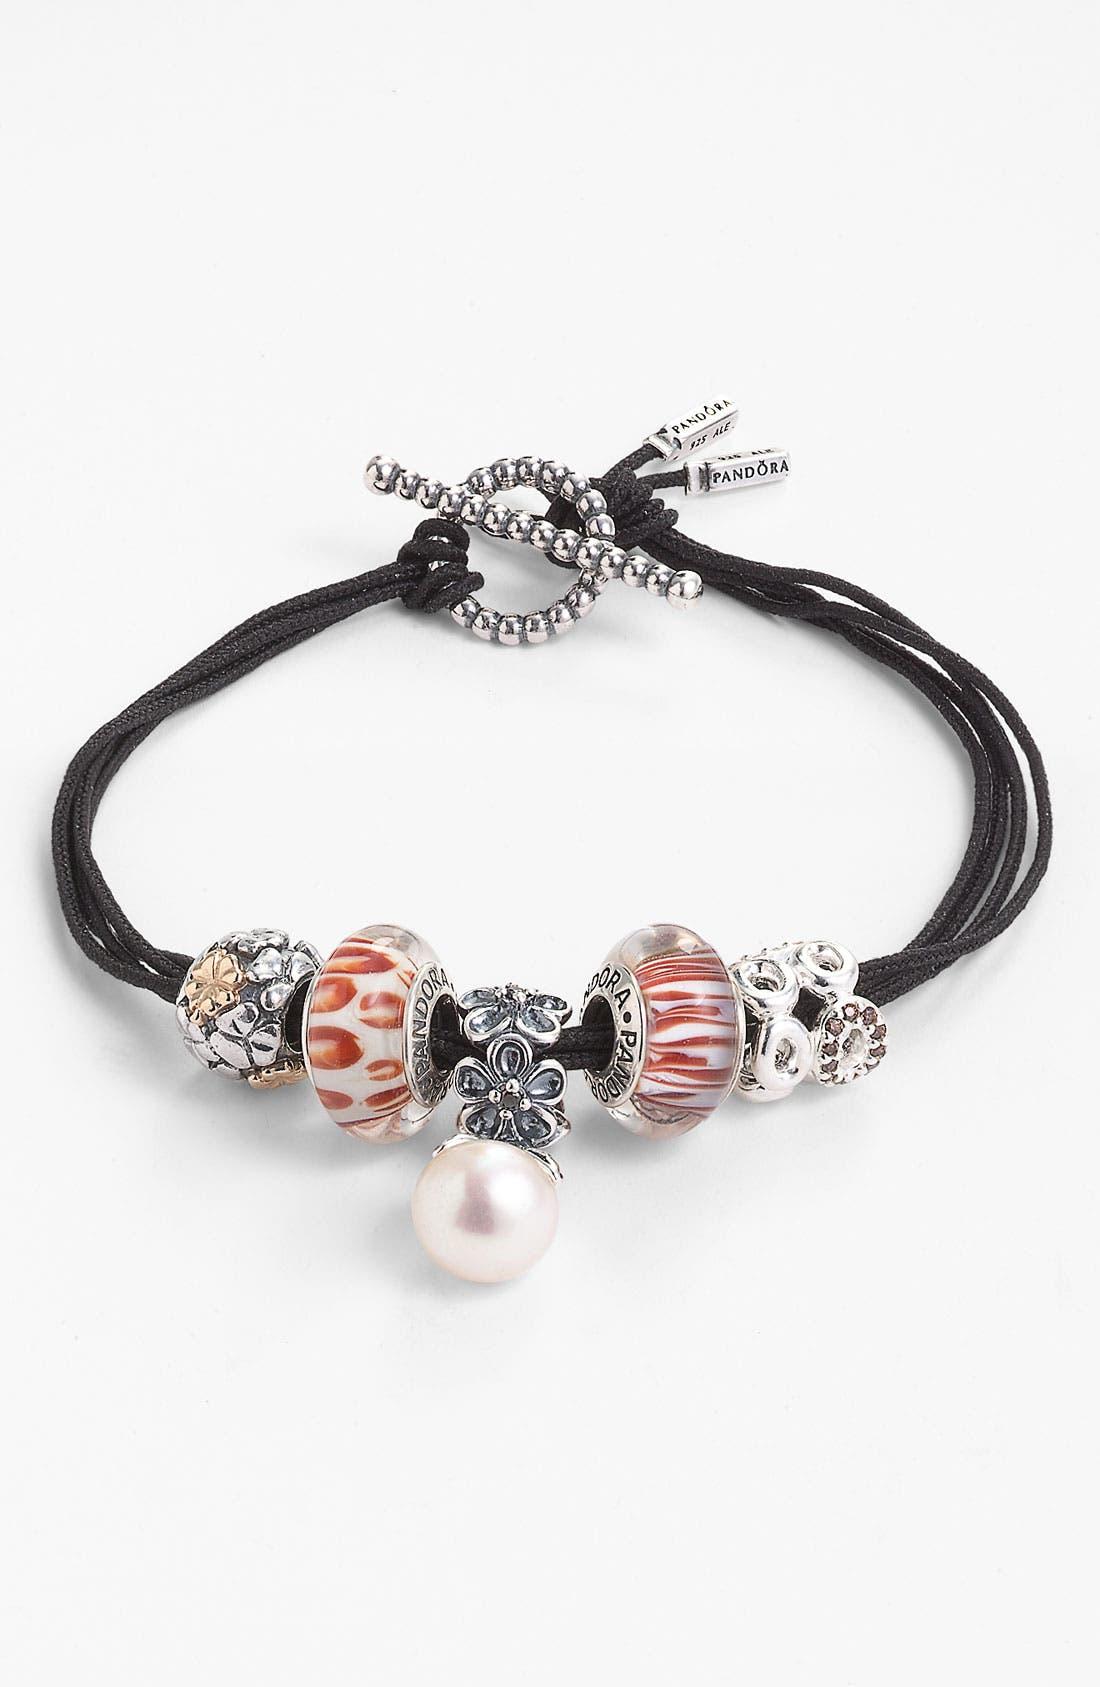 Main Image - PANDORA Customizable Charm Bracelet